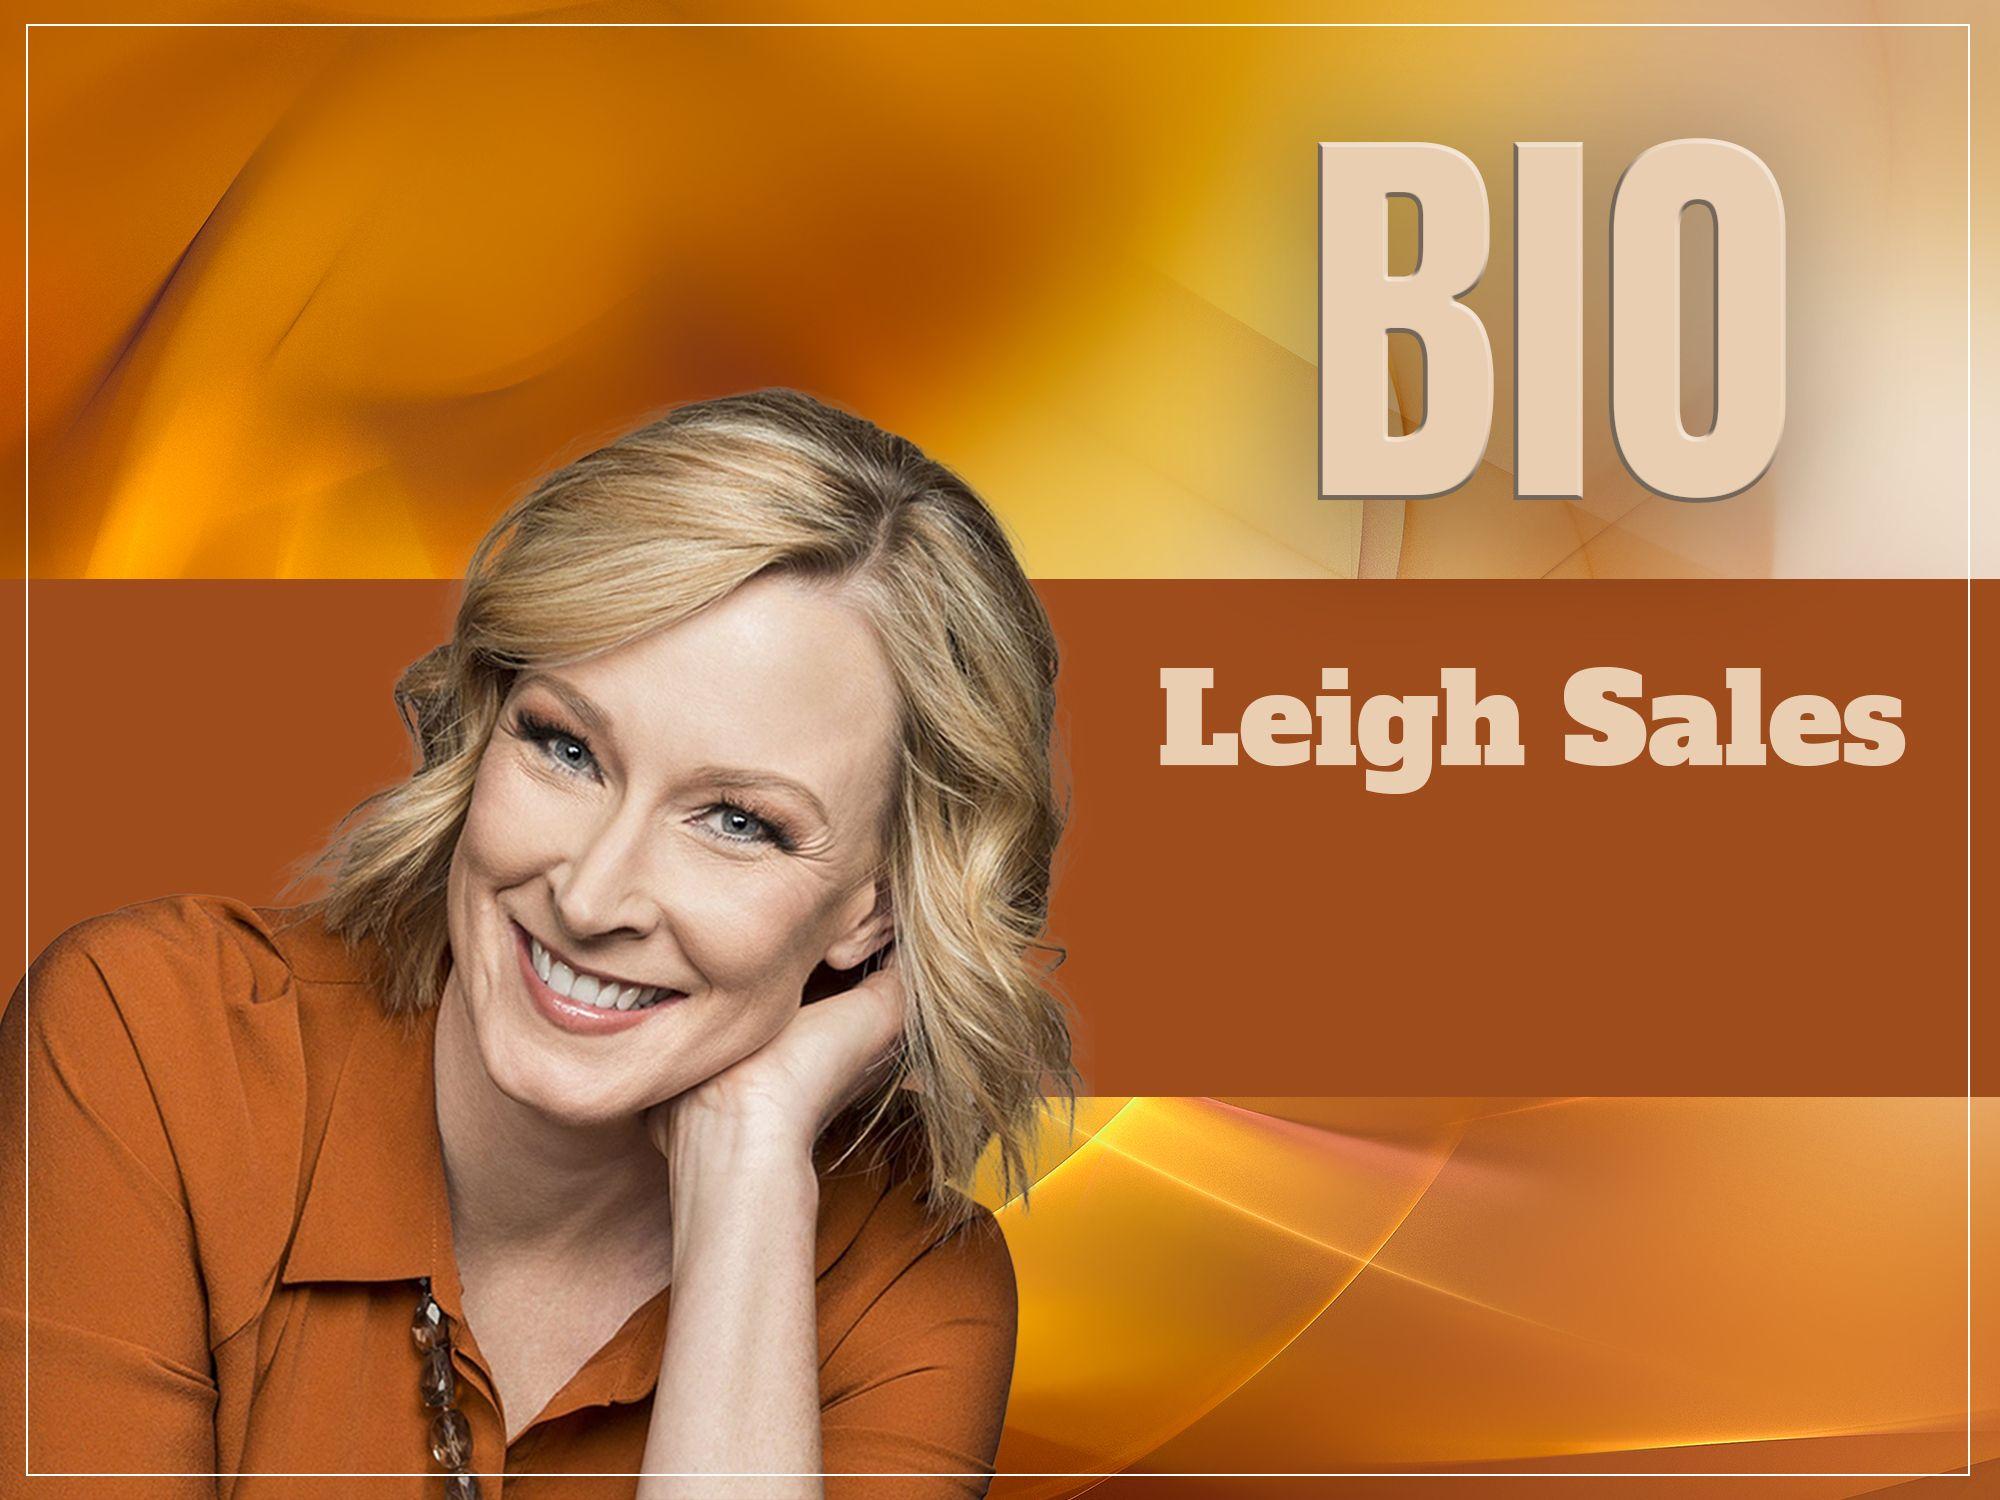 Leigh Sales, zaczytanyksiazkoholik.pl